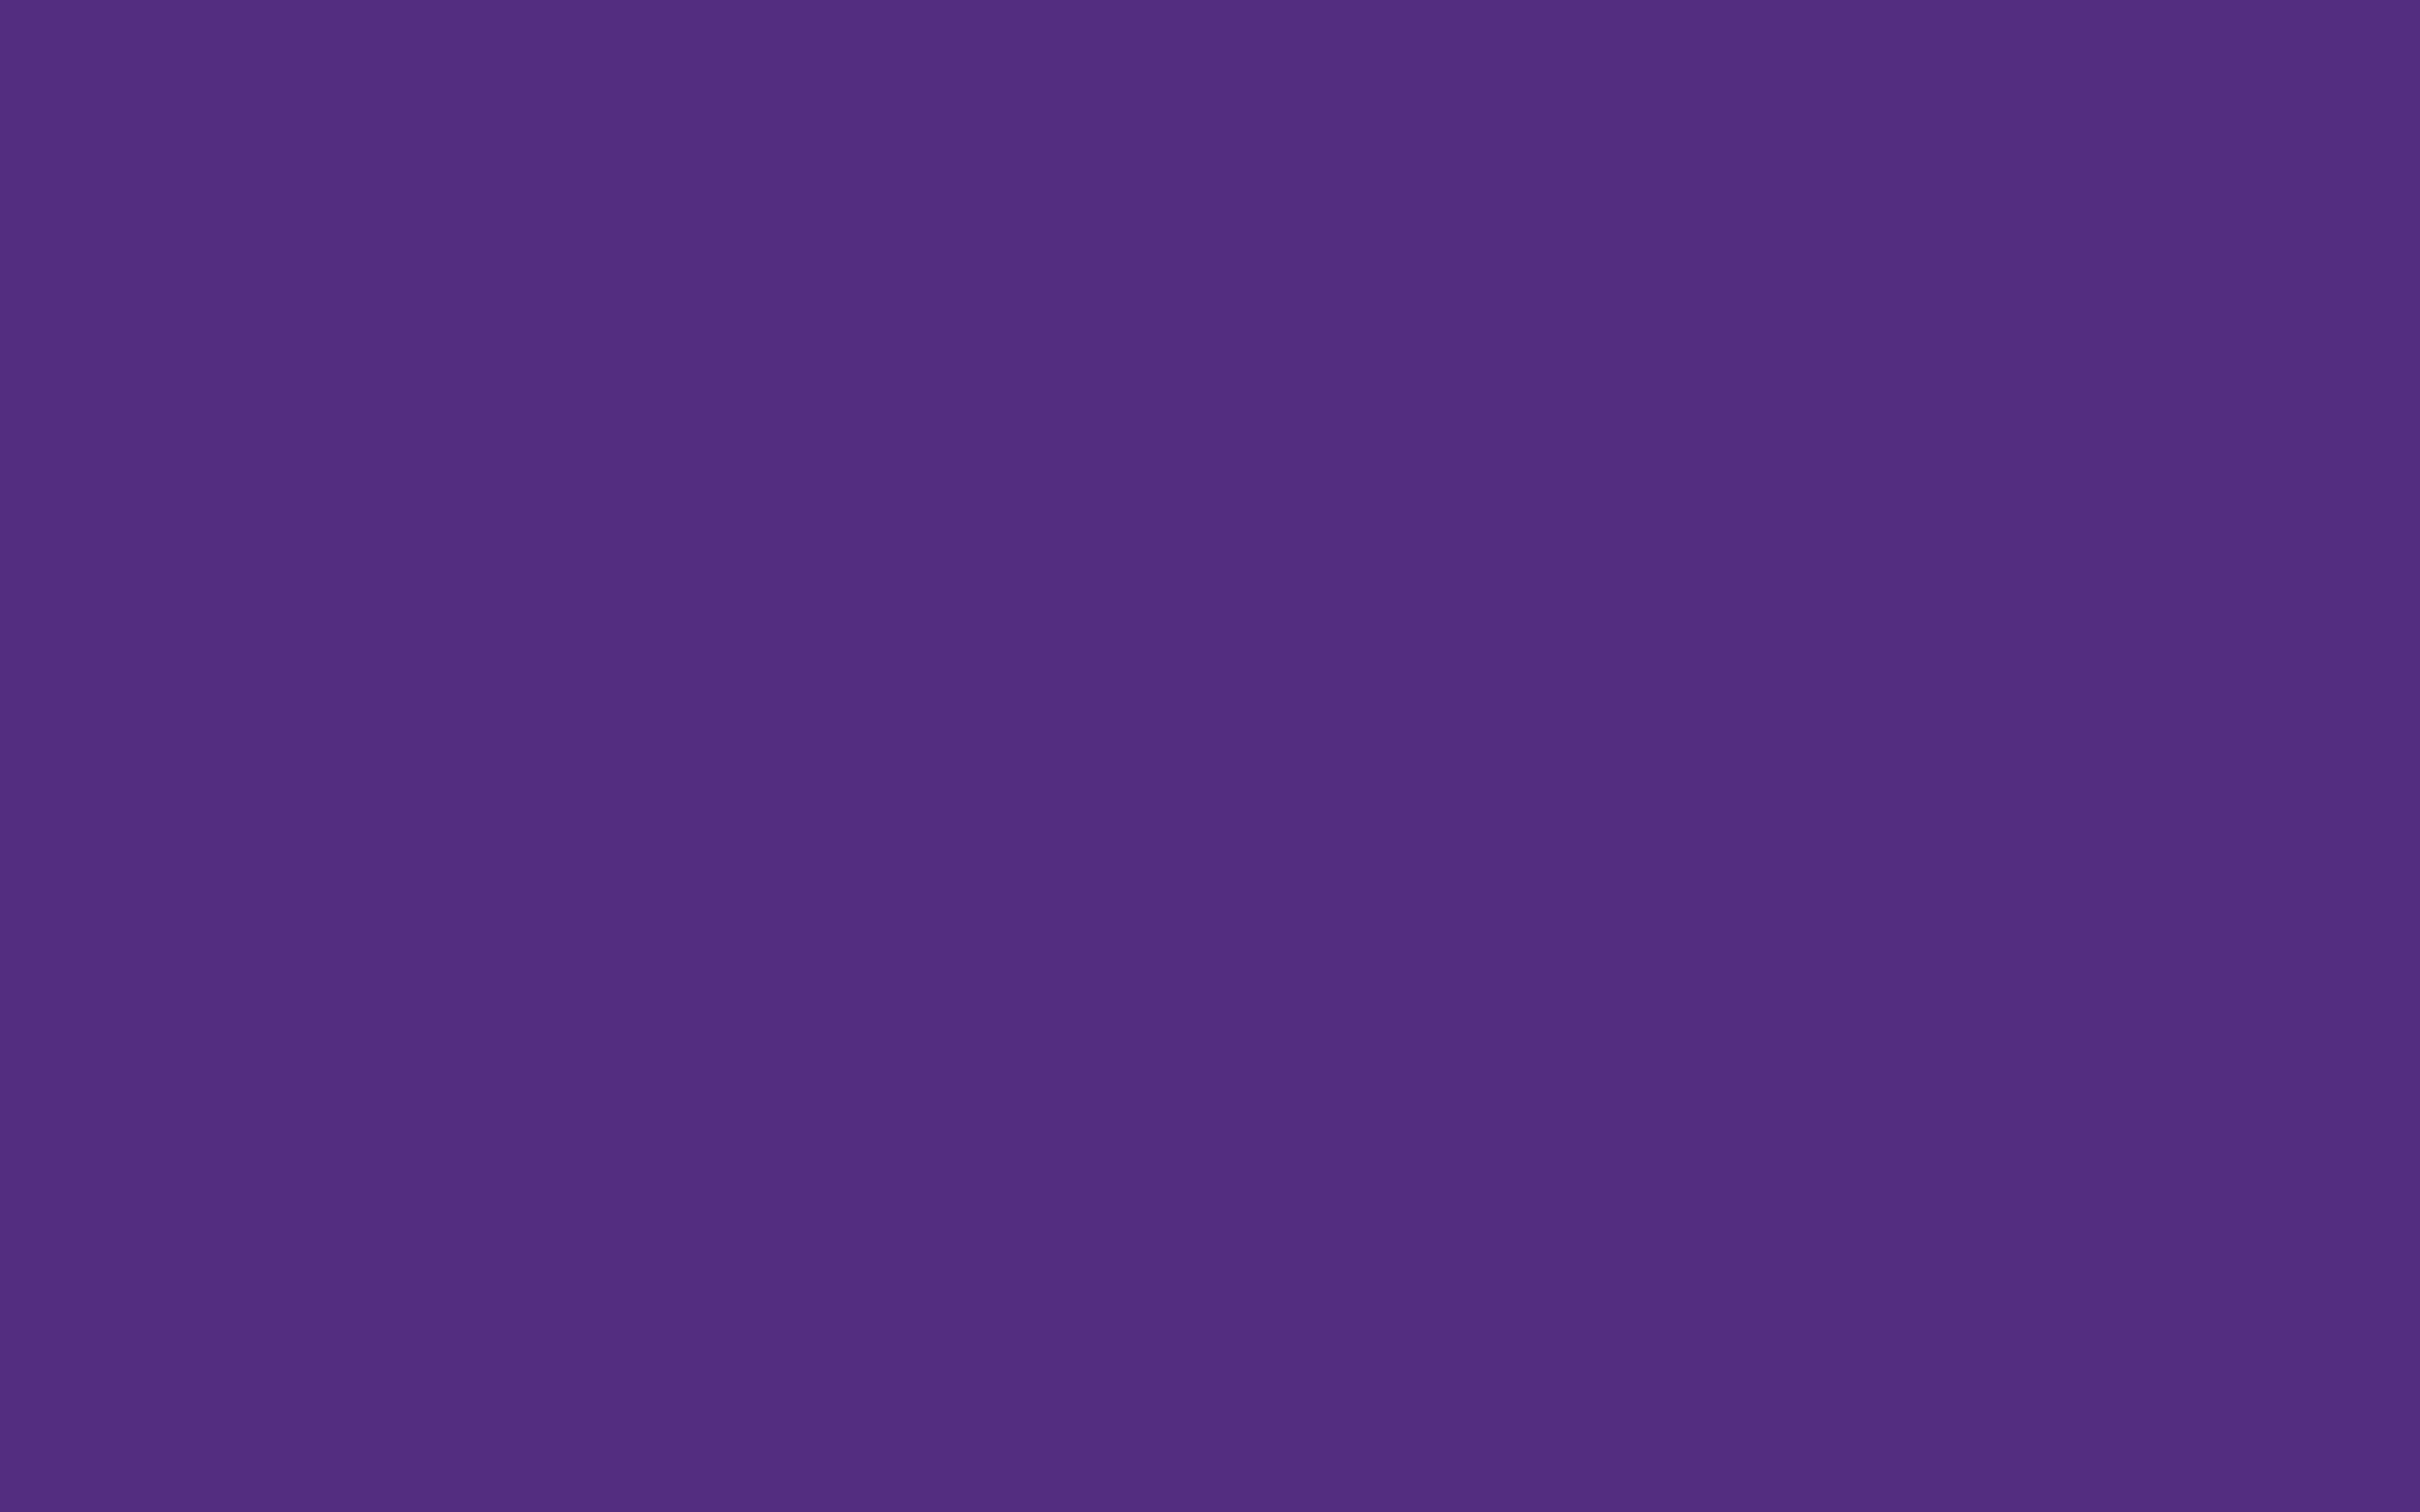 2560x1600 Regalia Solid Color Background